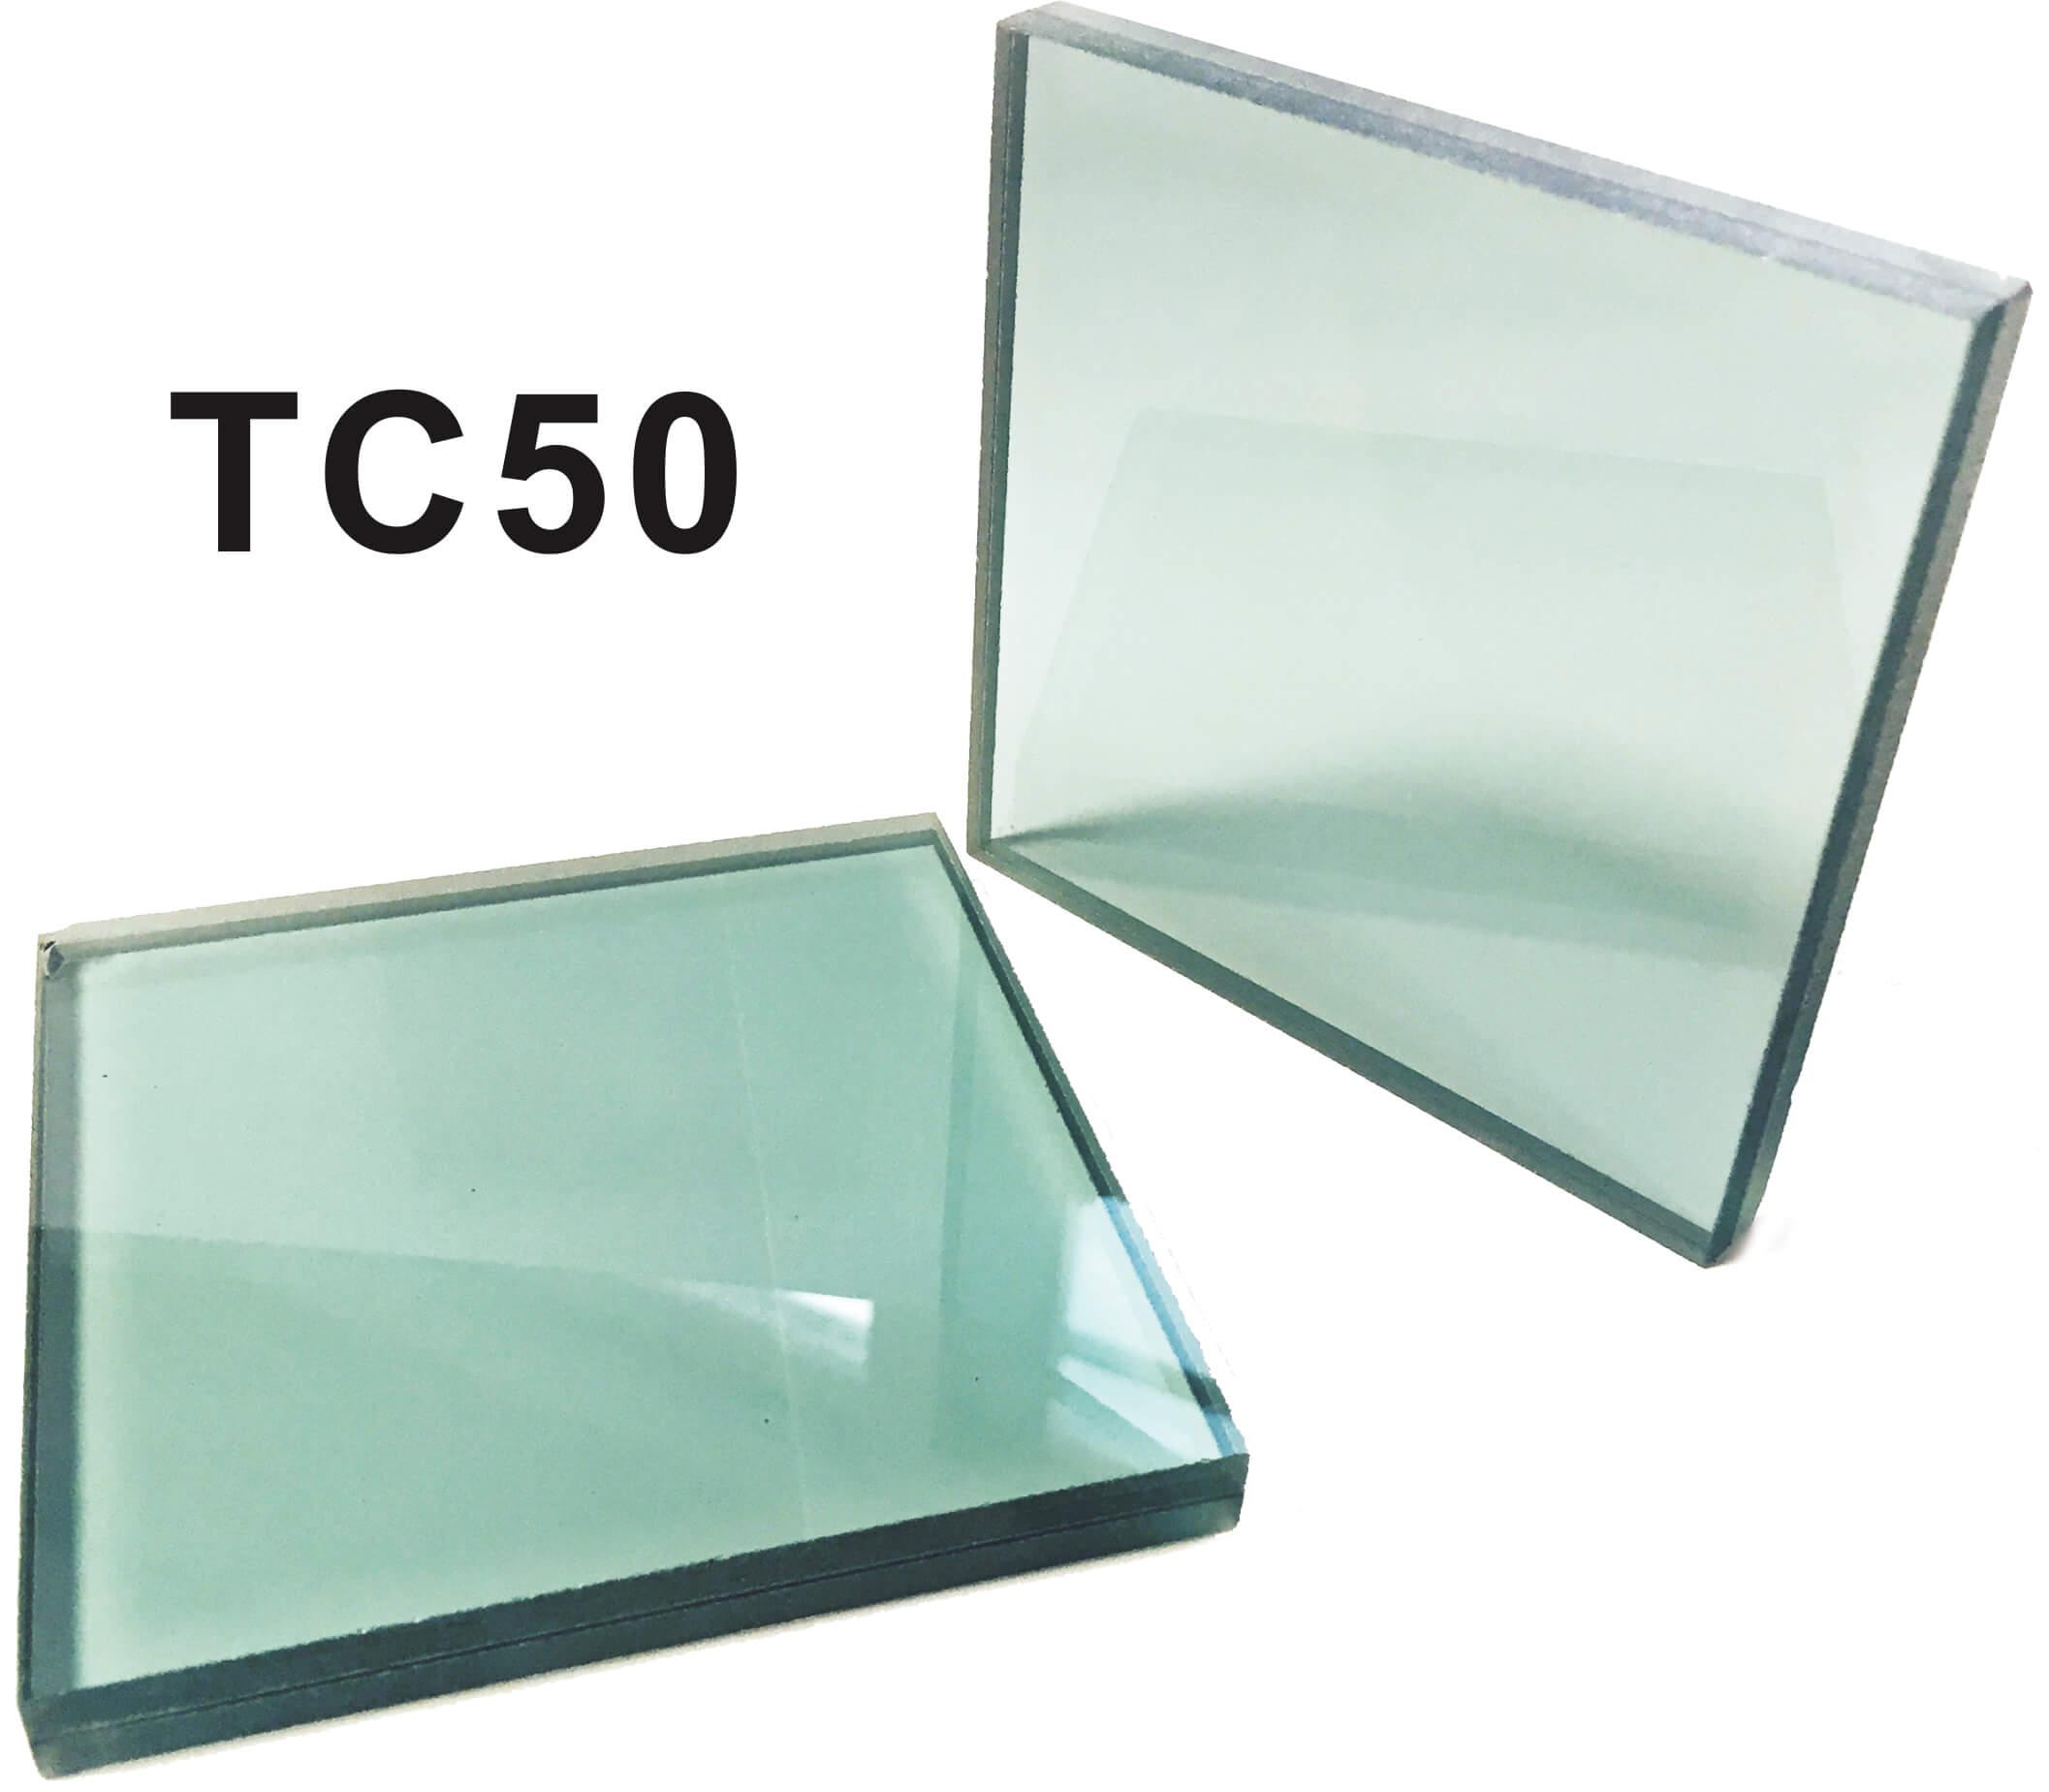 TC50節能膠合玻璃